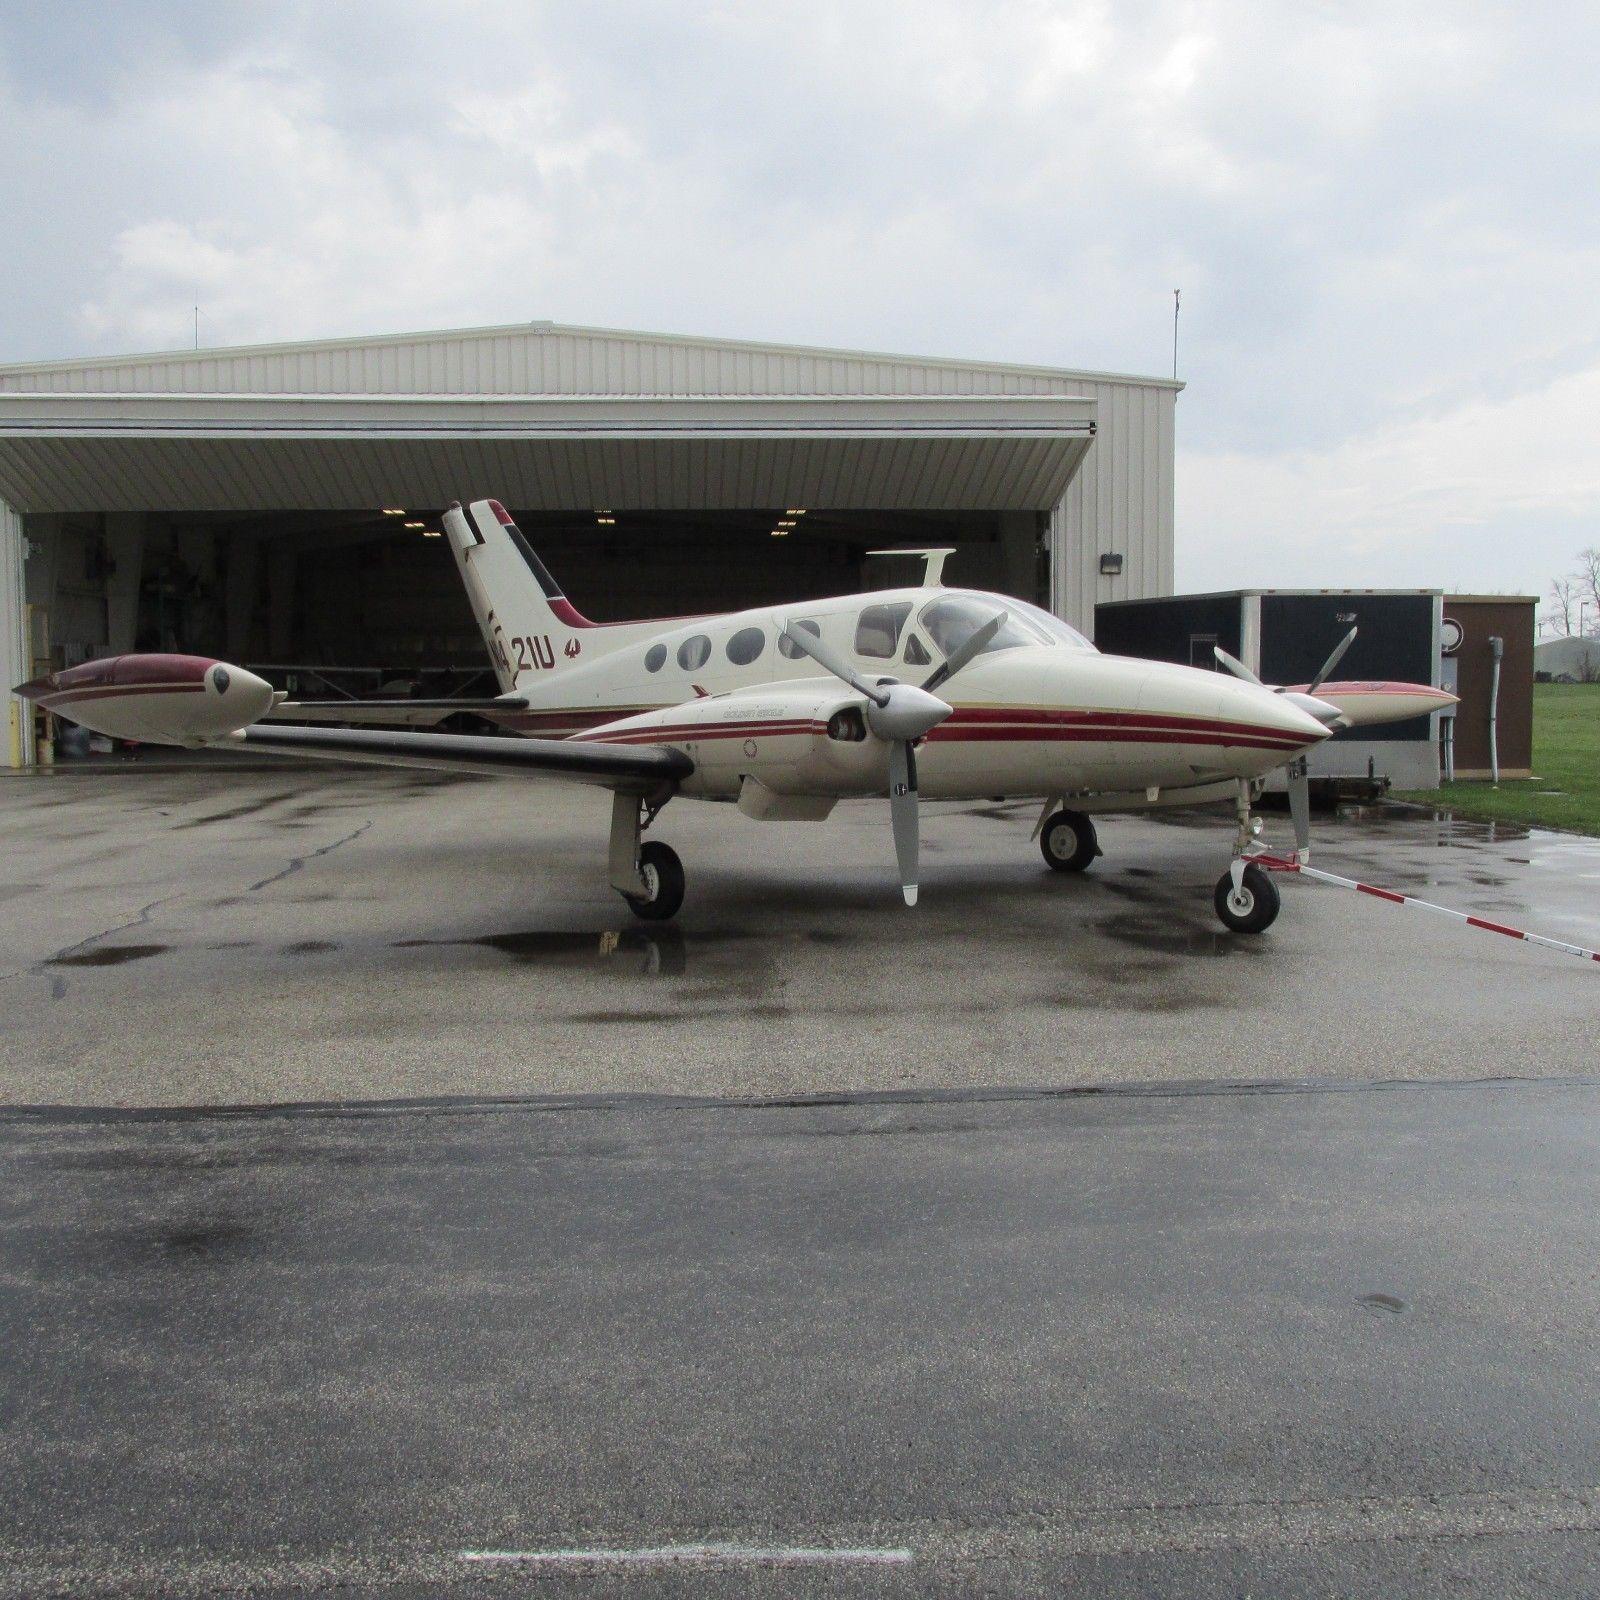 Overhauled 1967 Cessna 421 Golden Eagle aircraft for sale